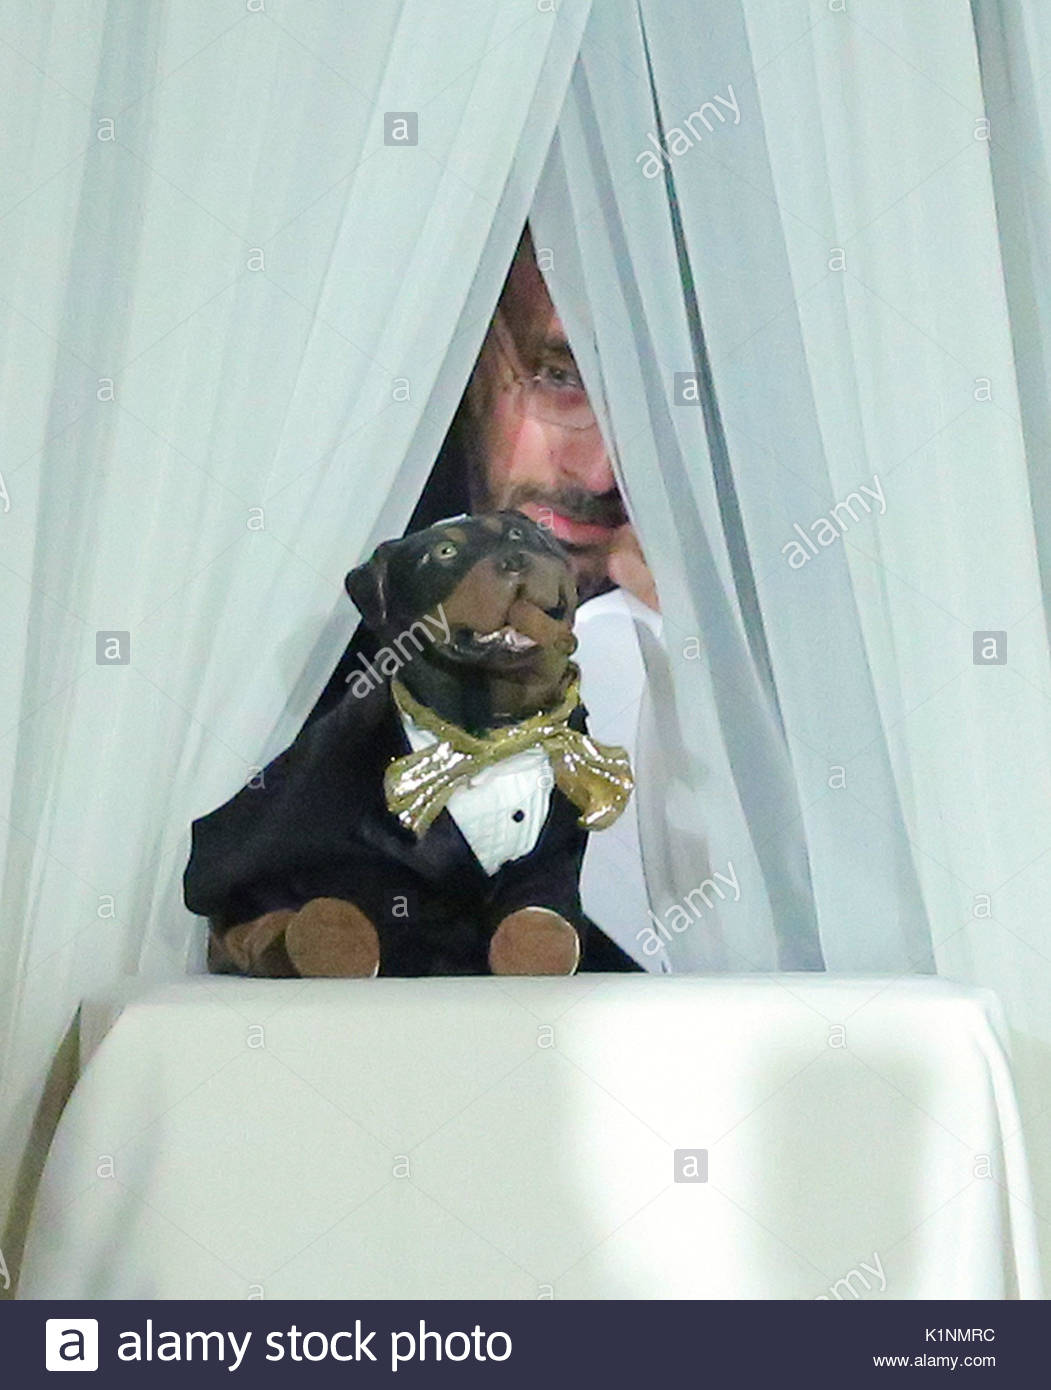 Magnificent Dog Tuxedos For Weddings Frieze - Wedding Dress Ideas ...